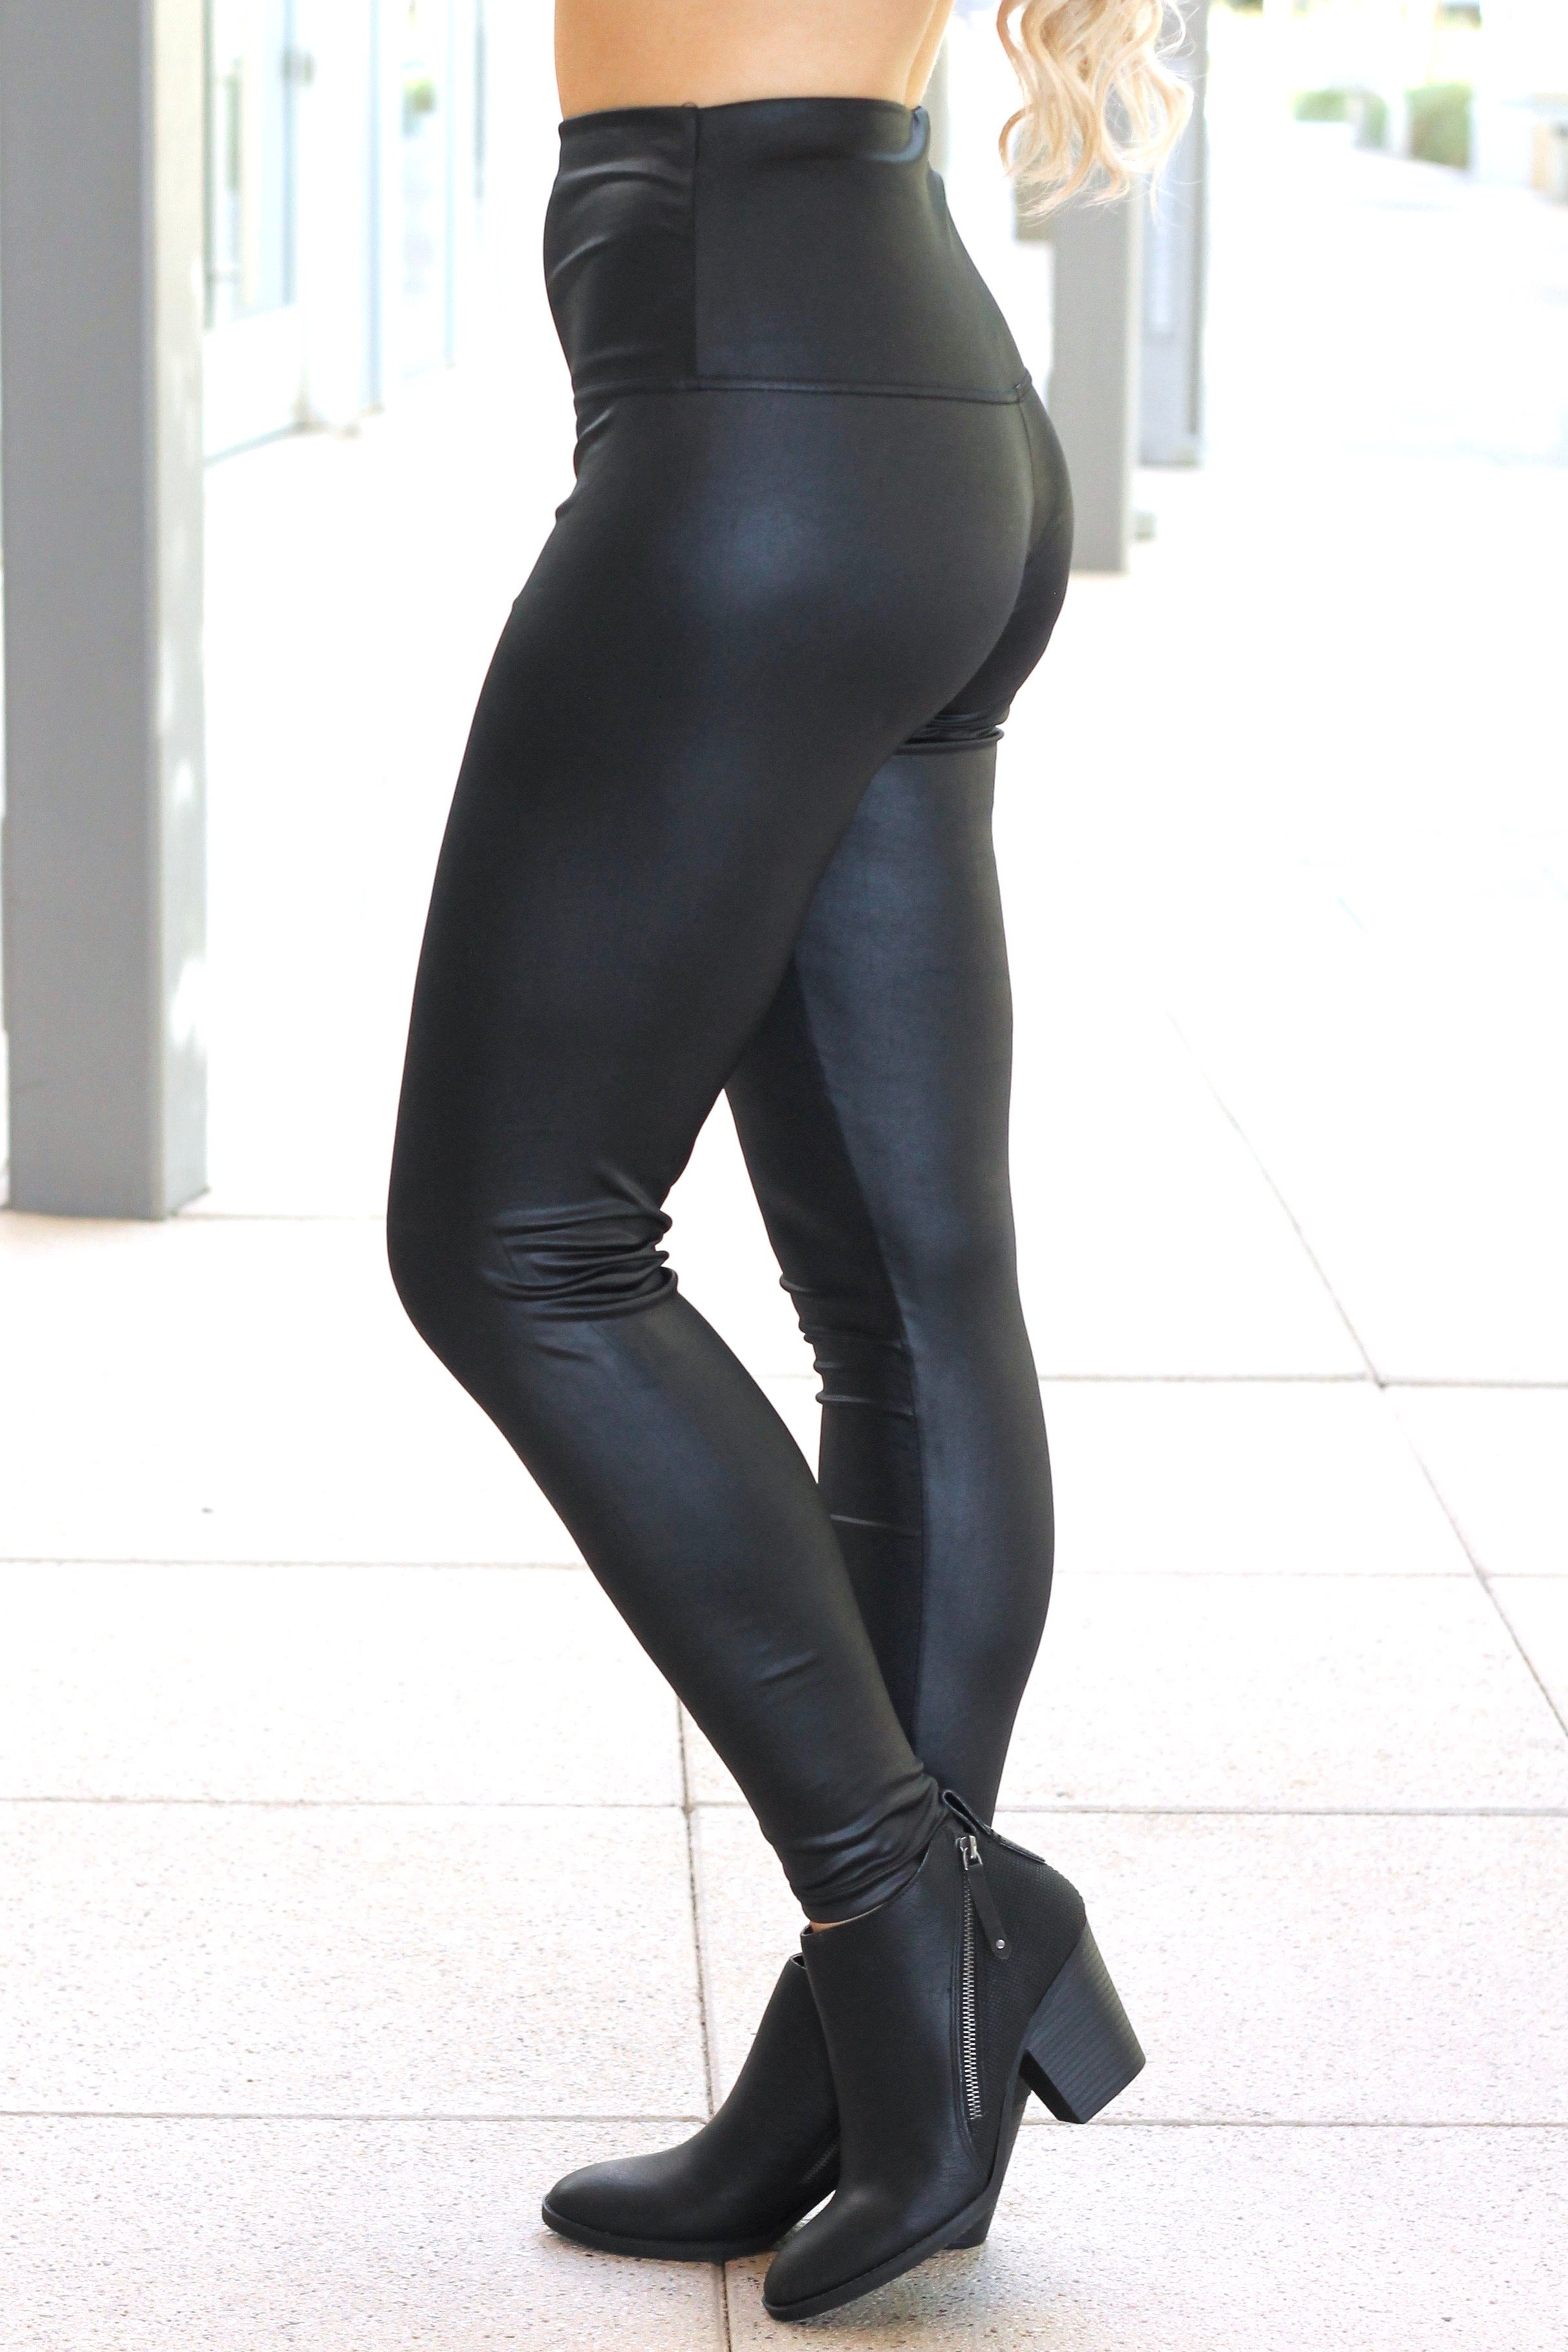 6605dde56f Liquid Leggings | High Waist | Outfit Inspiration | Leggings ...